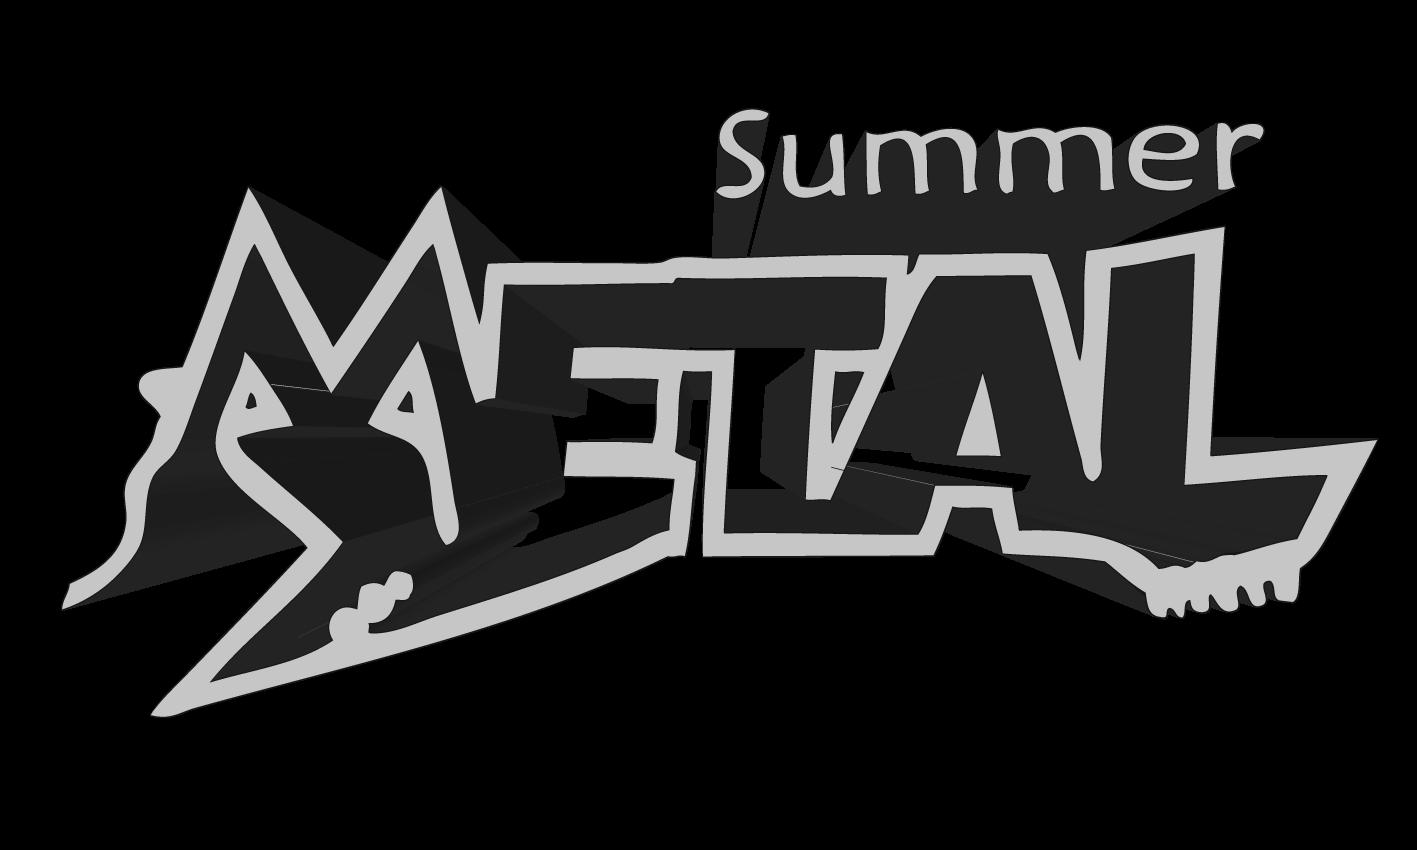 summermetal 2021